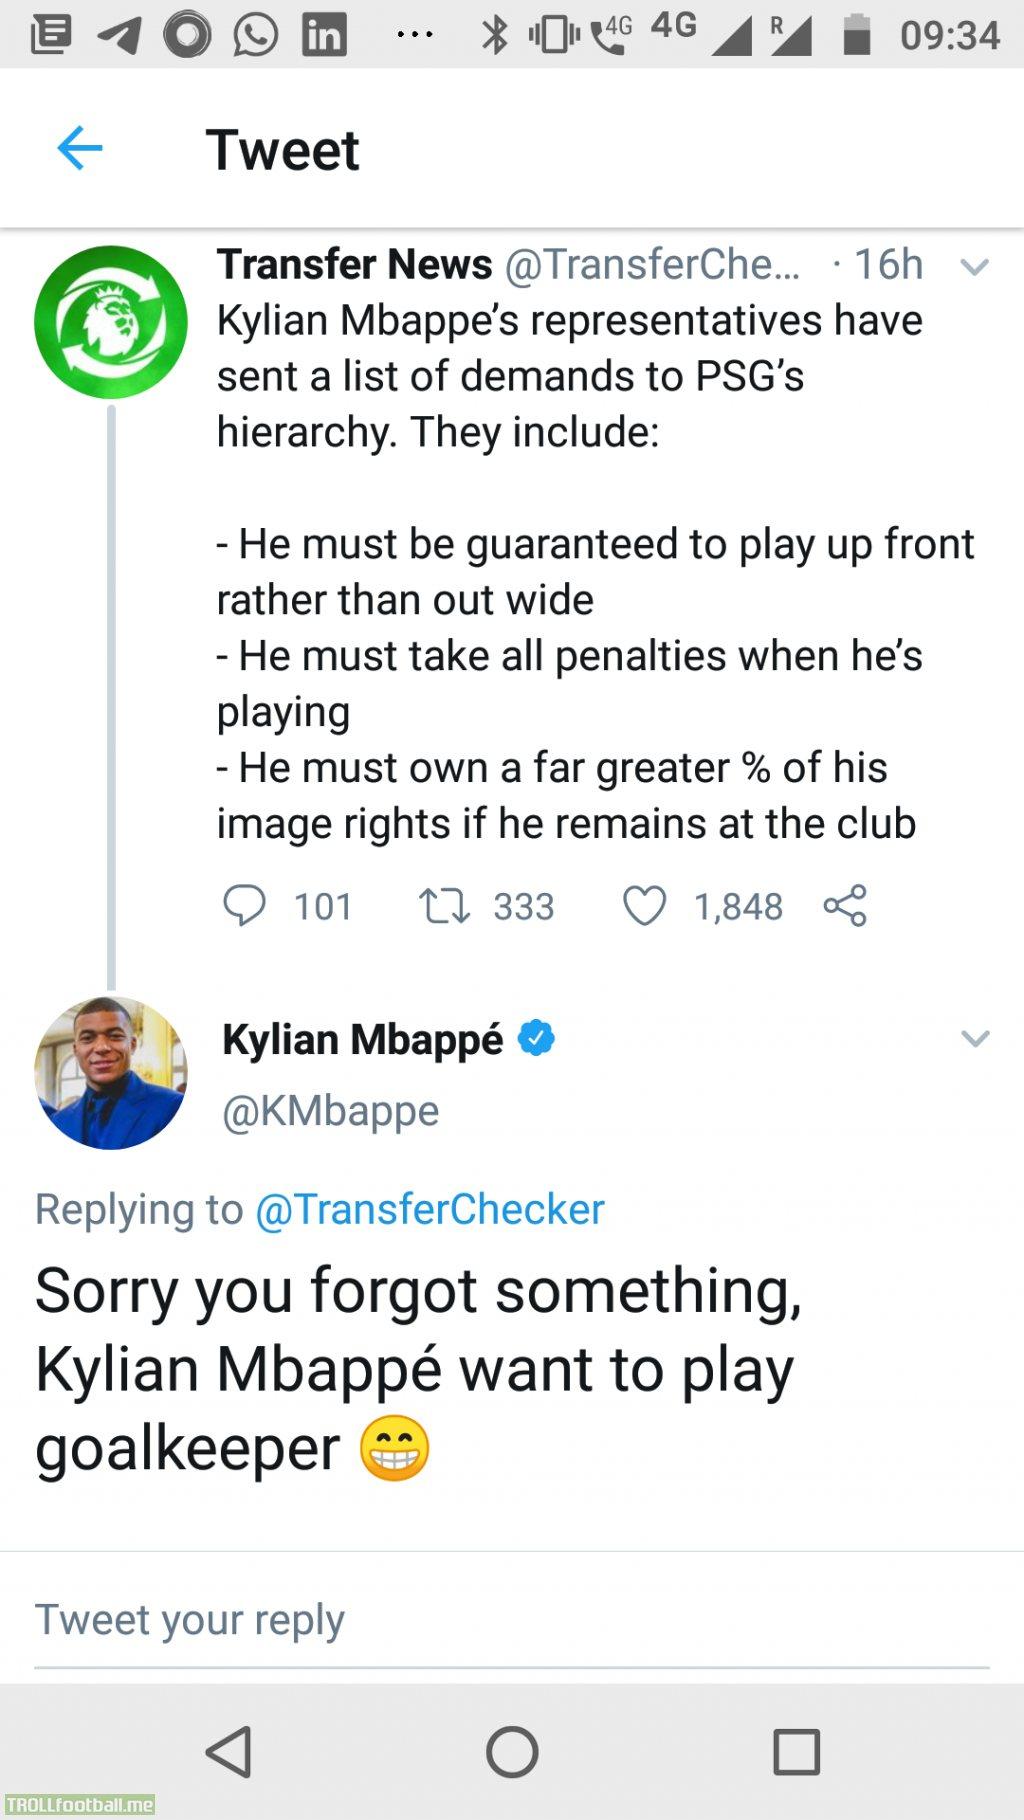 Kylian Mbappe shoots down a transfer rumormonger